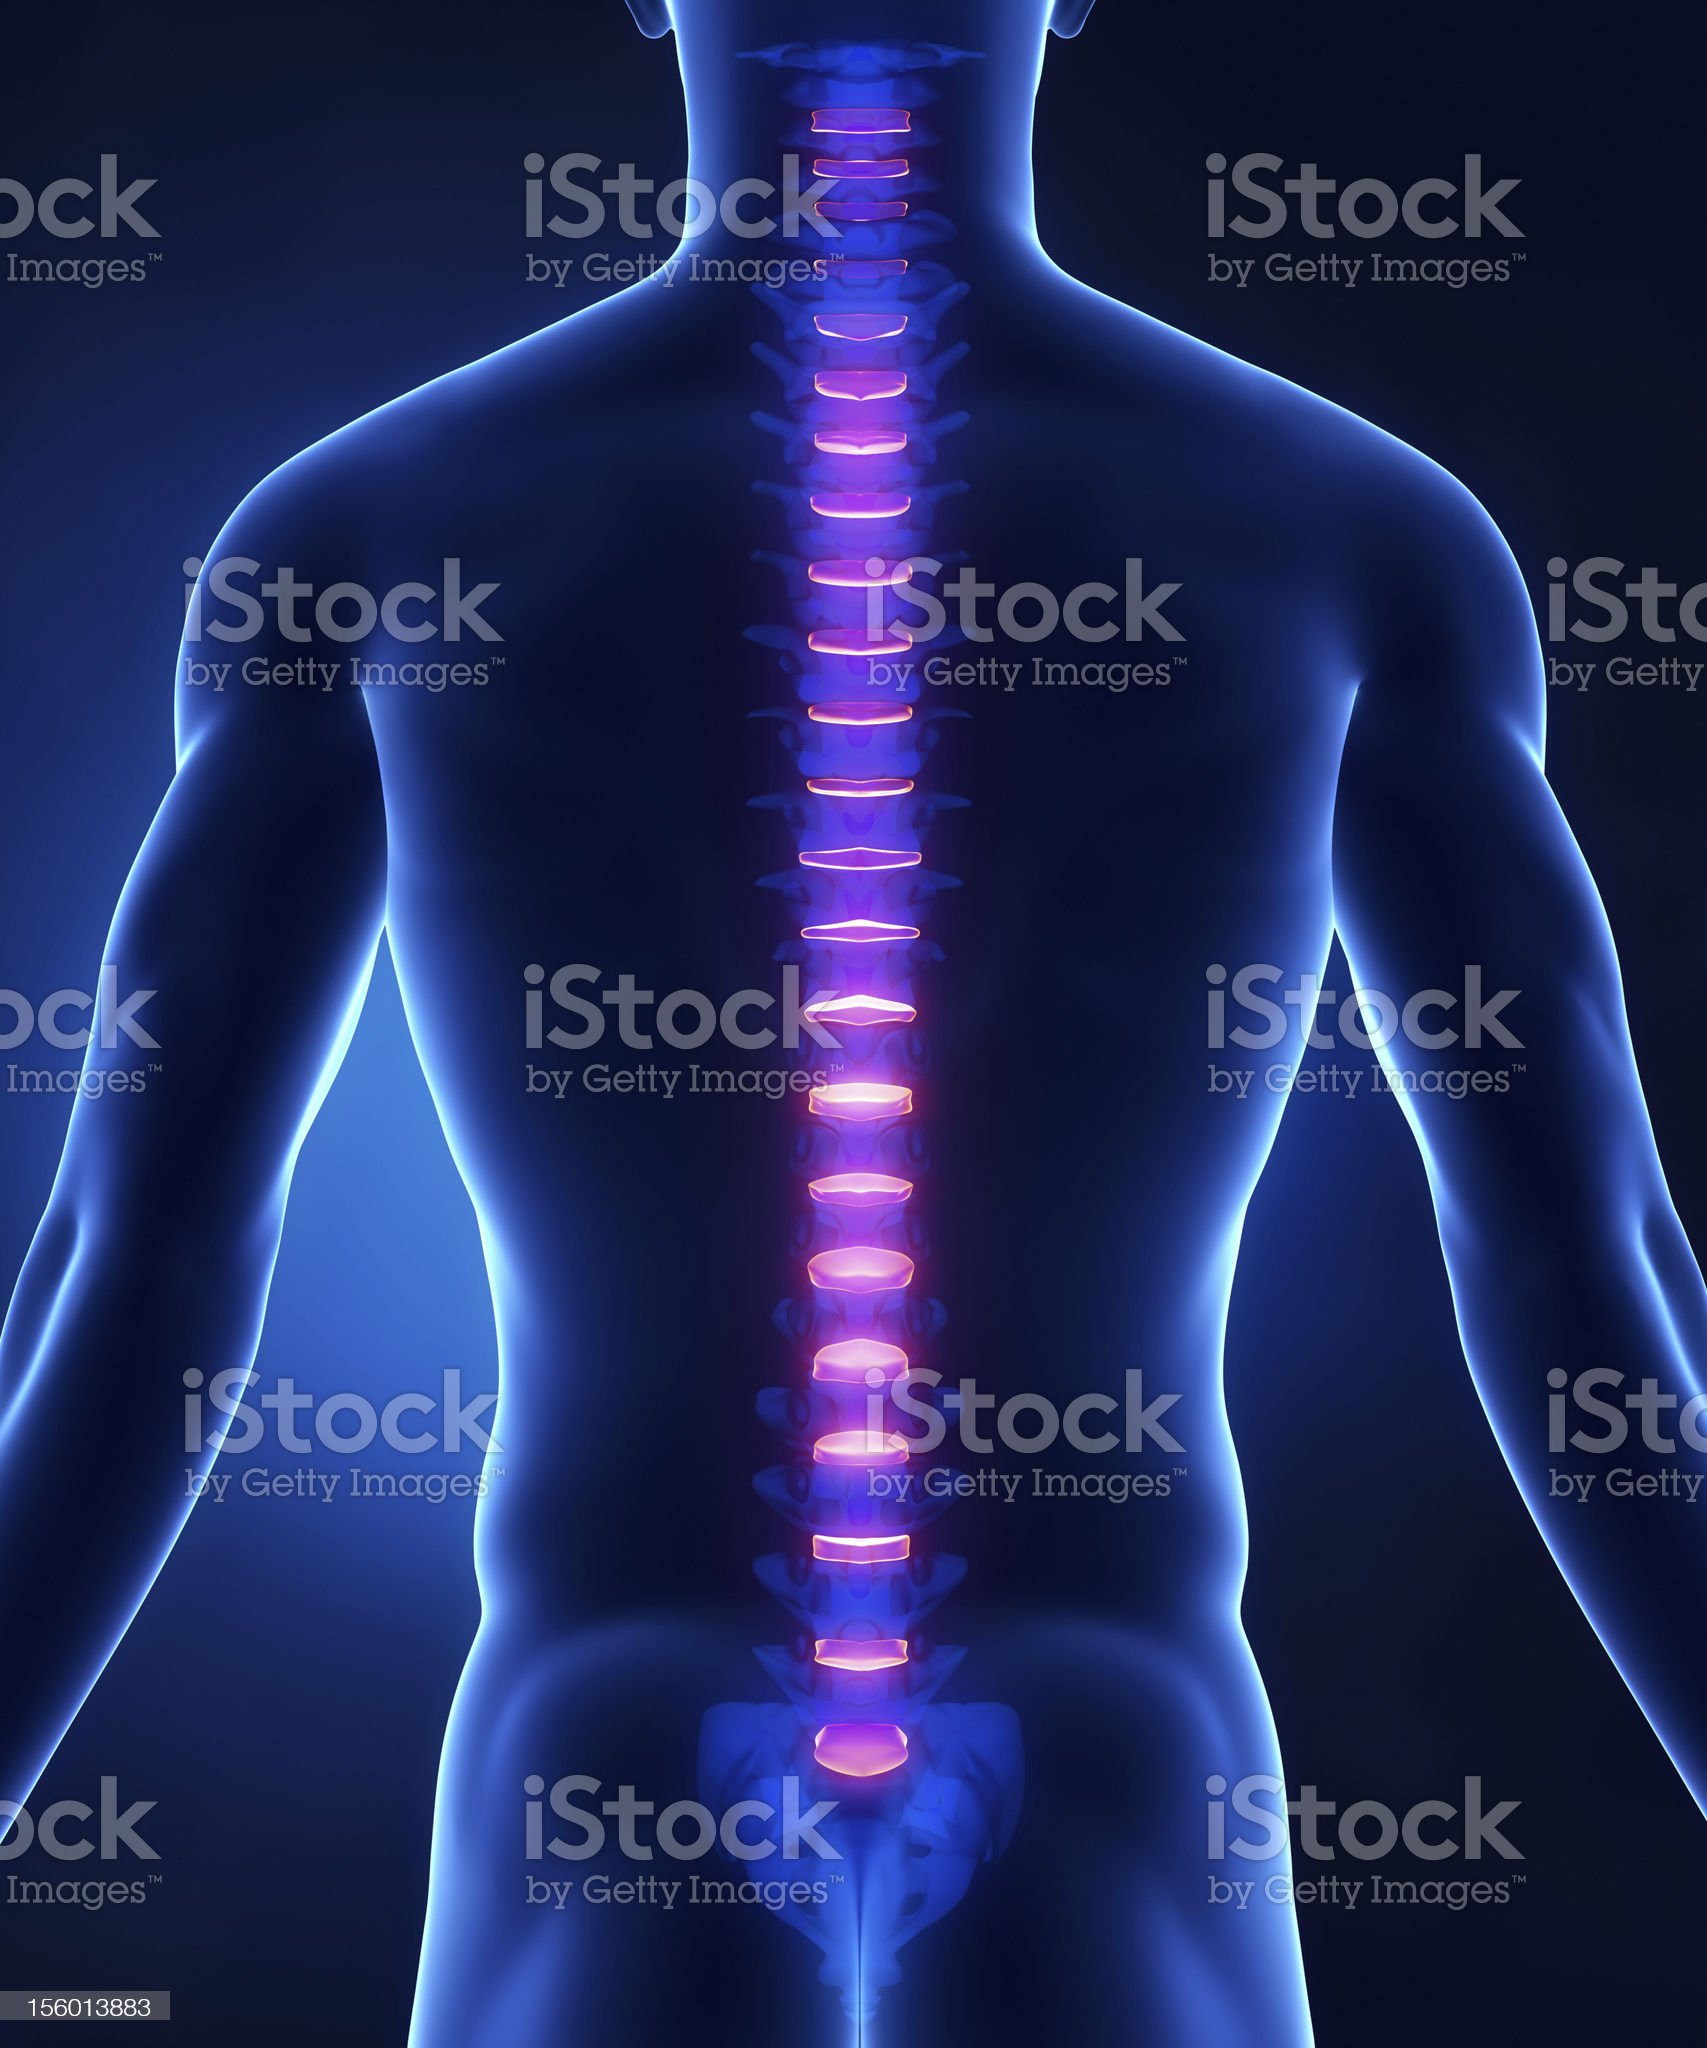 Backbone intervertebral disc anatomy posterior view royalty-free stock photo